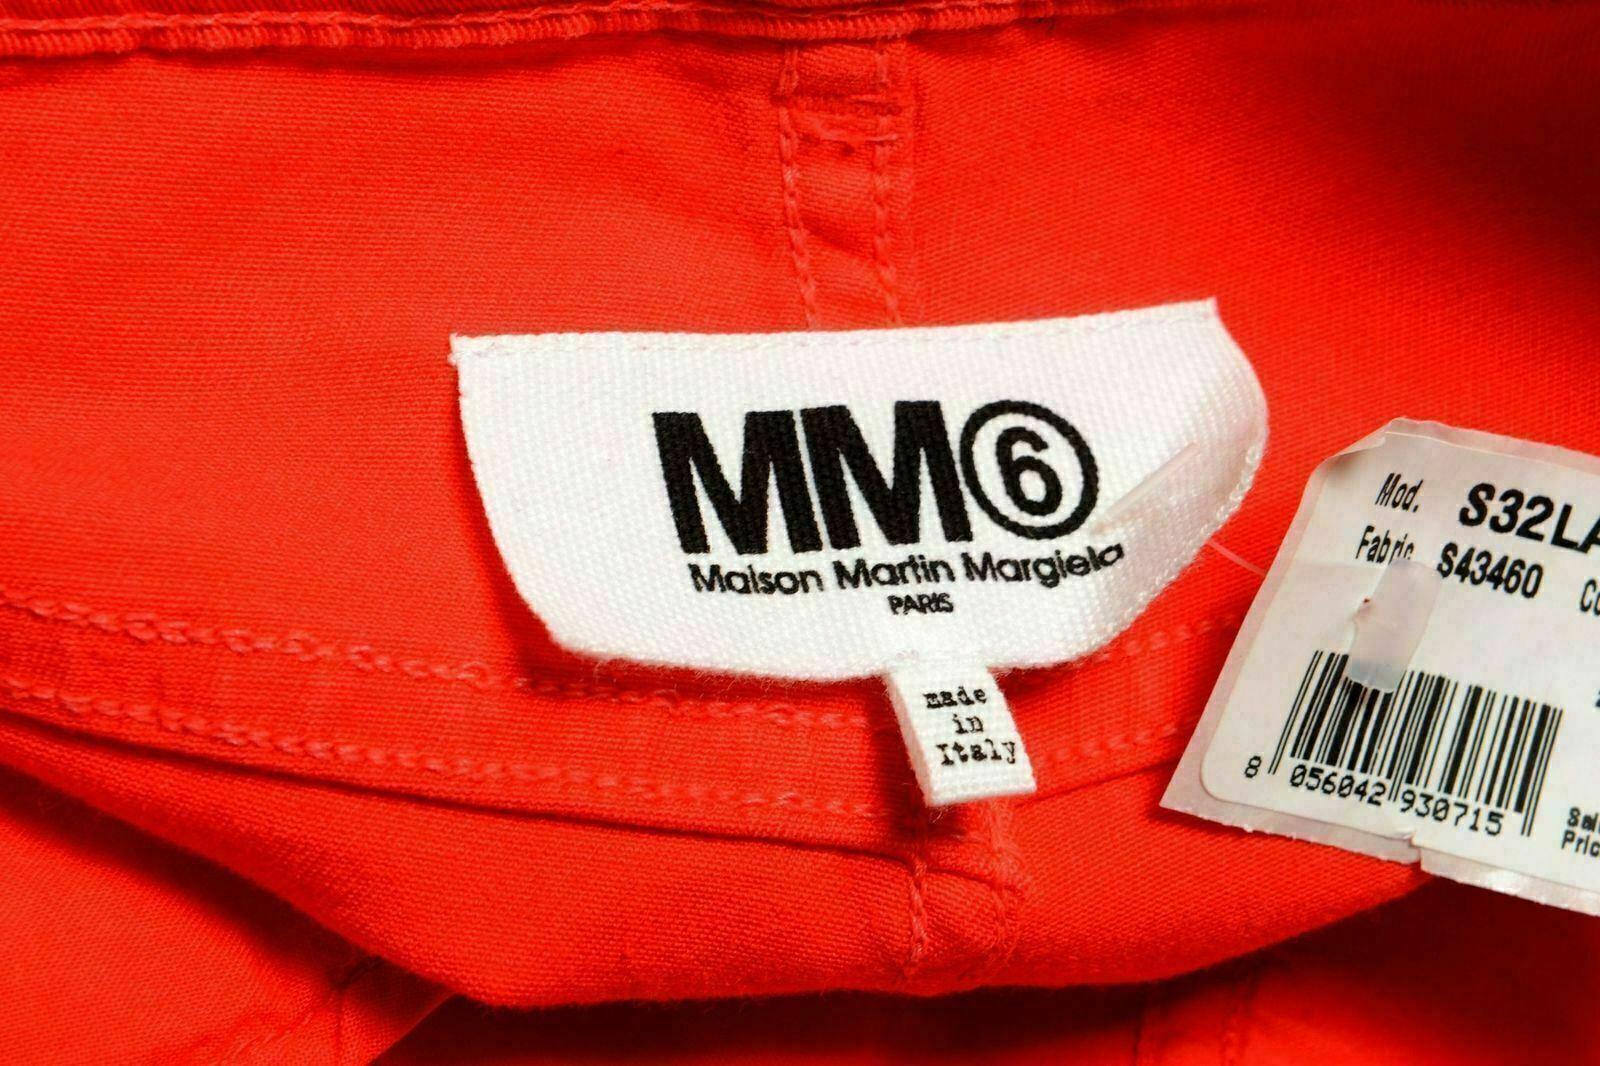 Maison Maison Maison Margiela Mm6 da Donna Rosso Stretch Jeans Aderenti Us 6 31b618